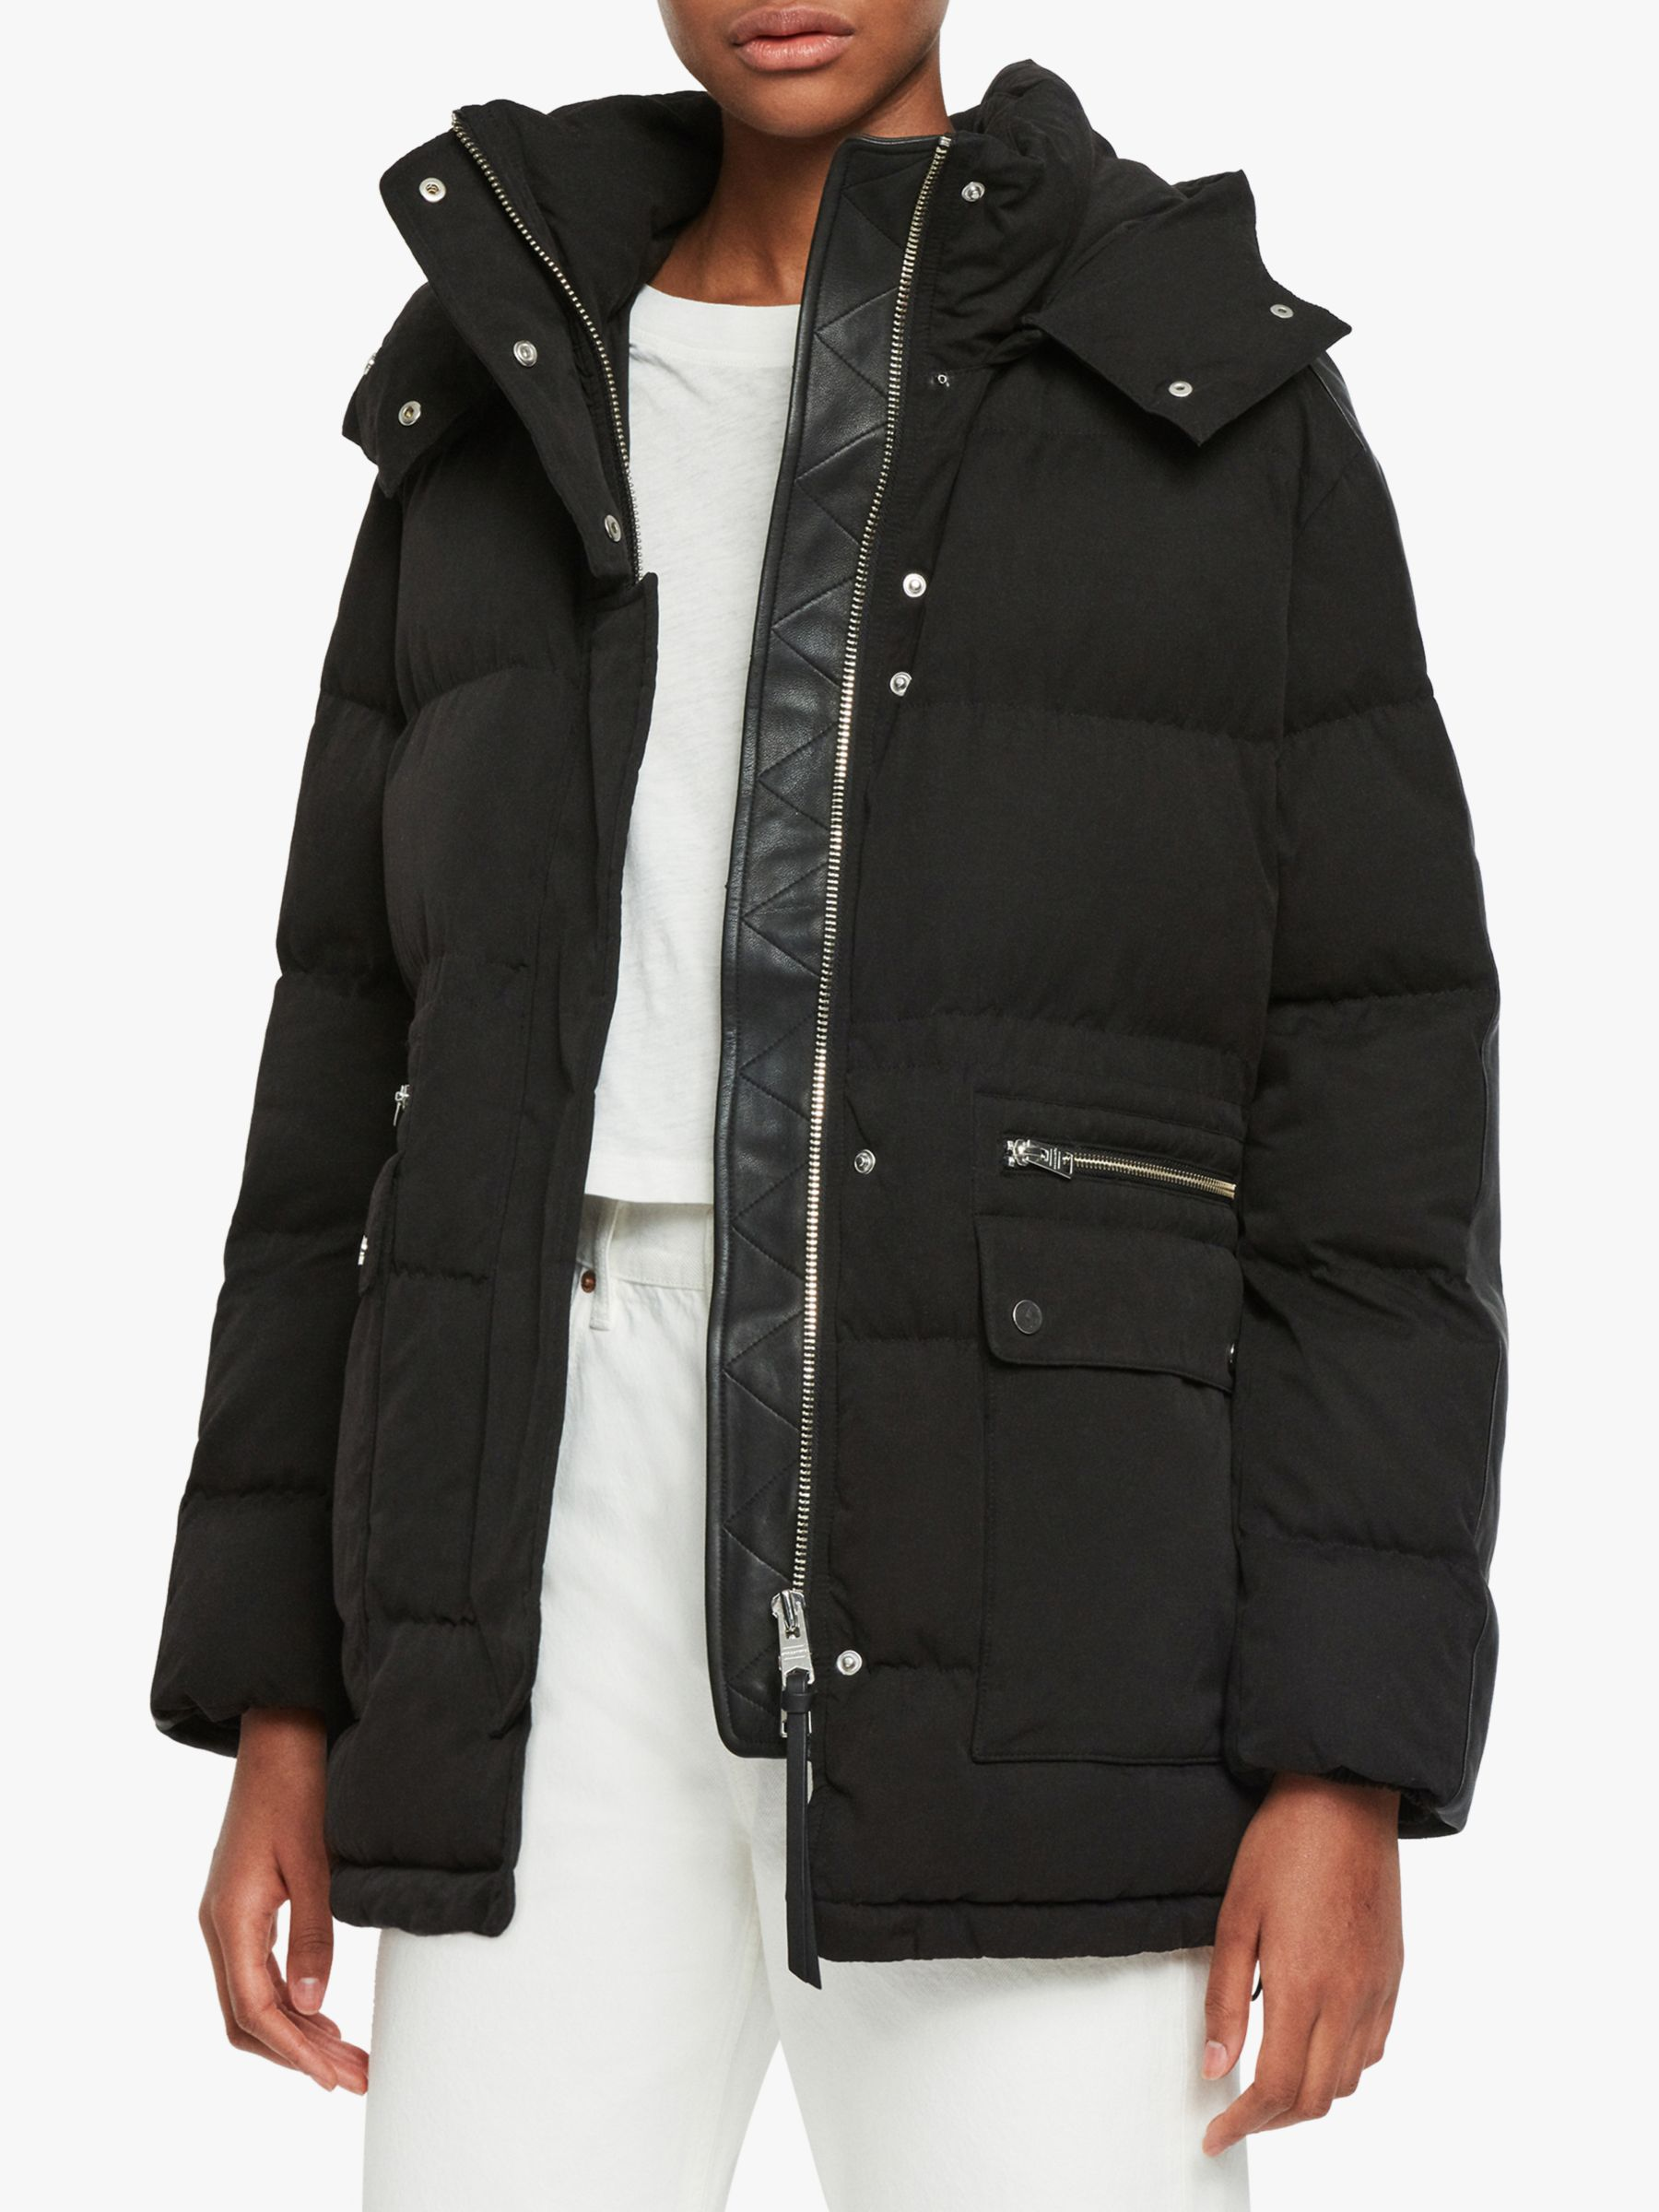 AllSaints AllSaints Kyle Parka Puffer Jacket, Black